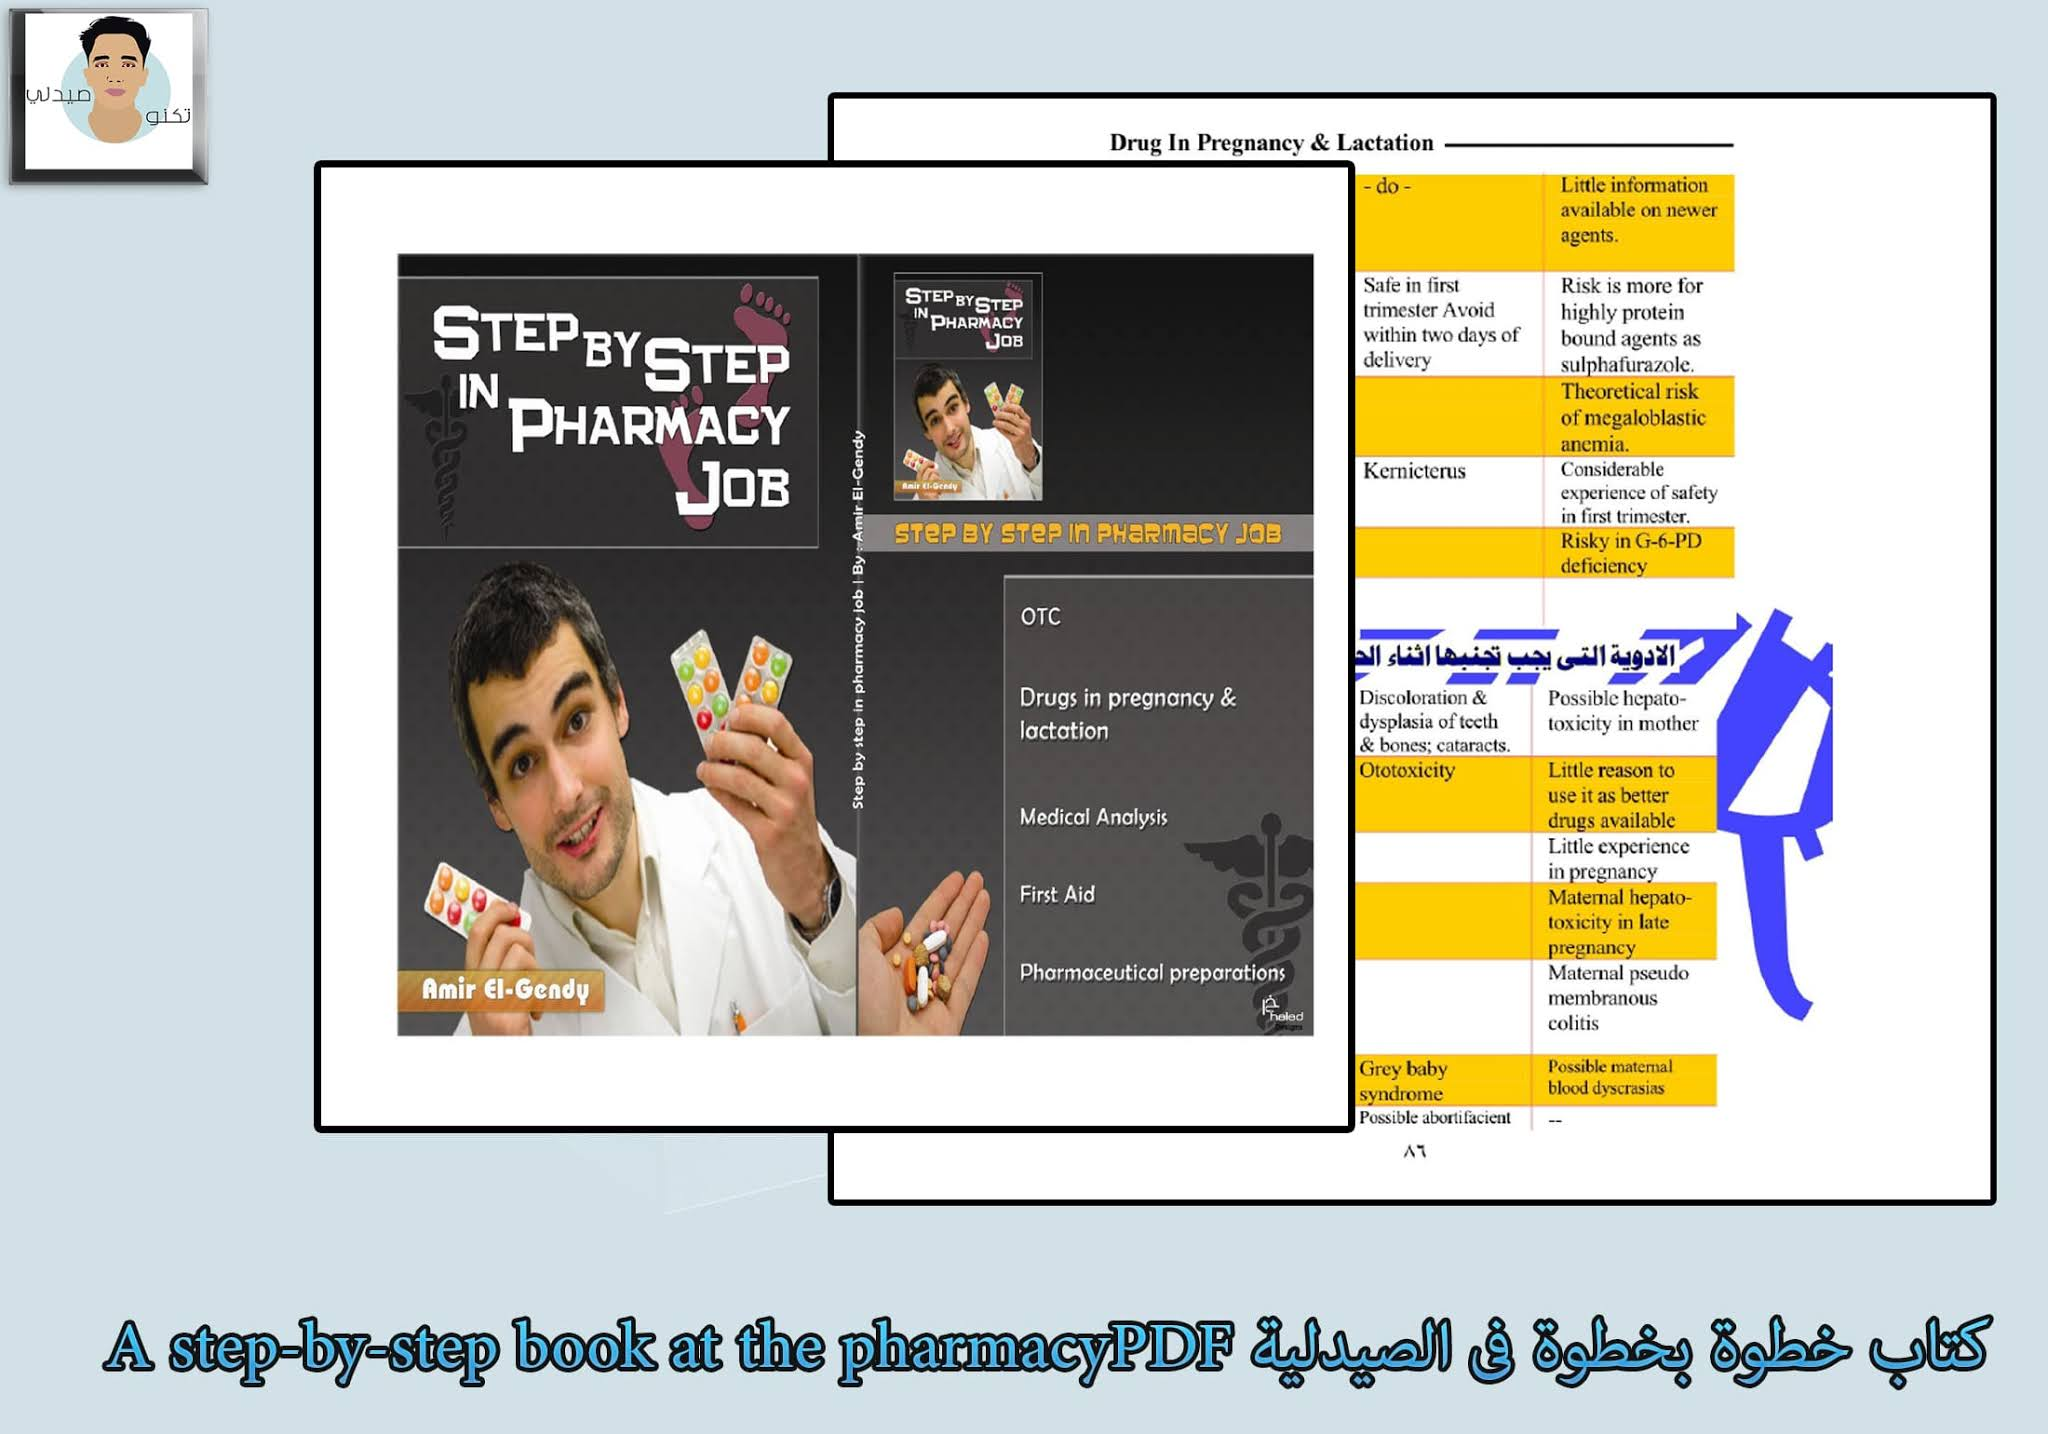 كتاب خطوة بخطوة فى الصيدلية A step-by-step book at the pharmacy PDF